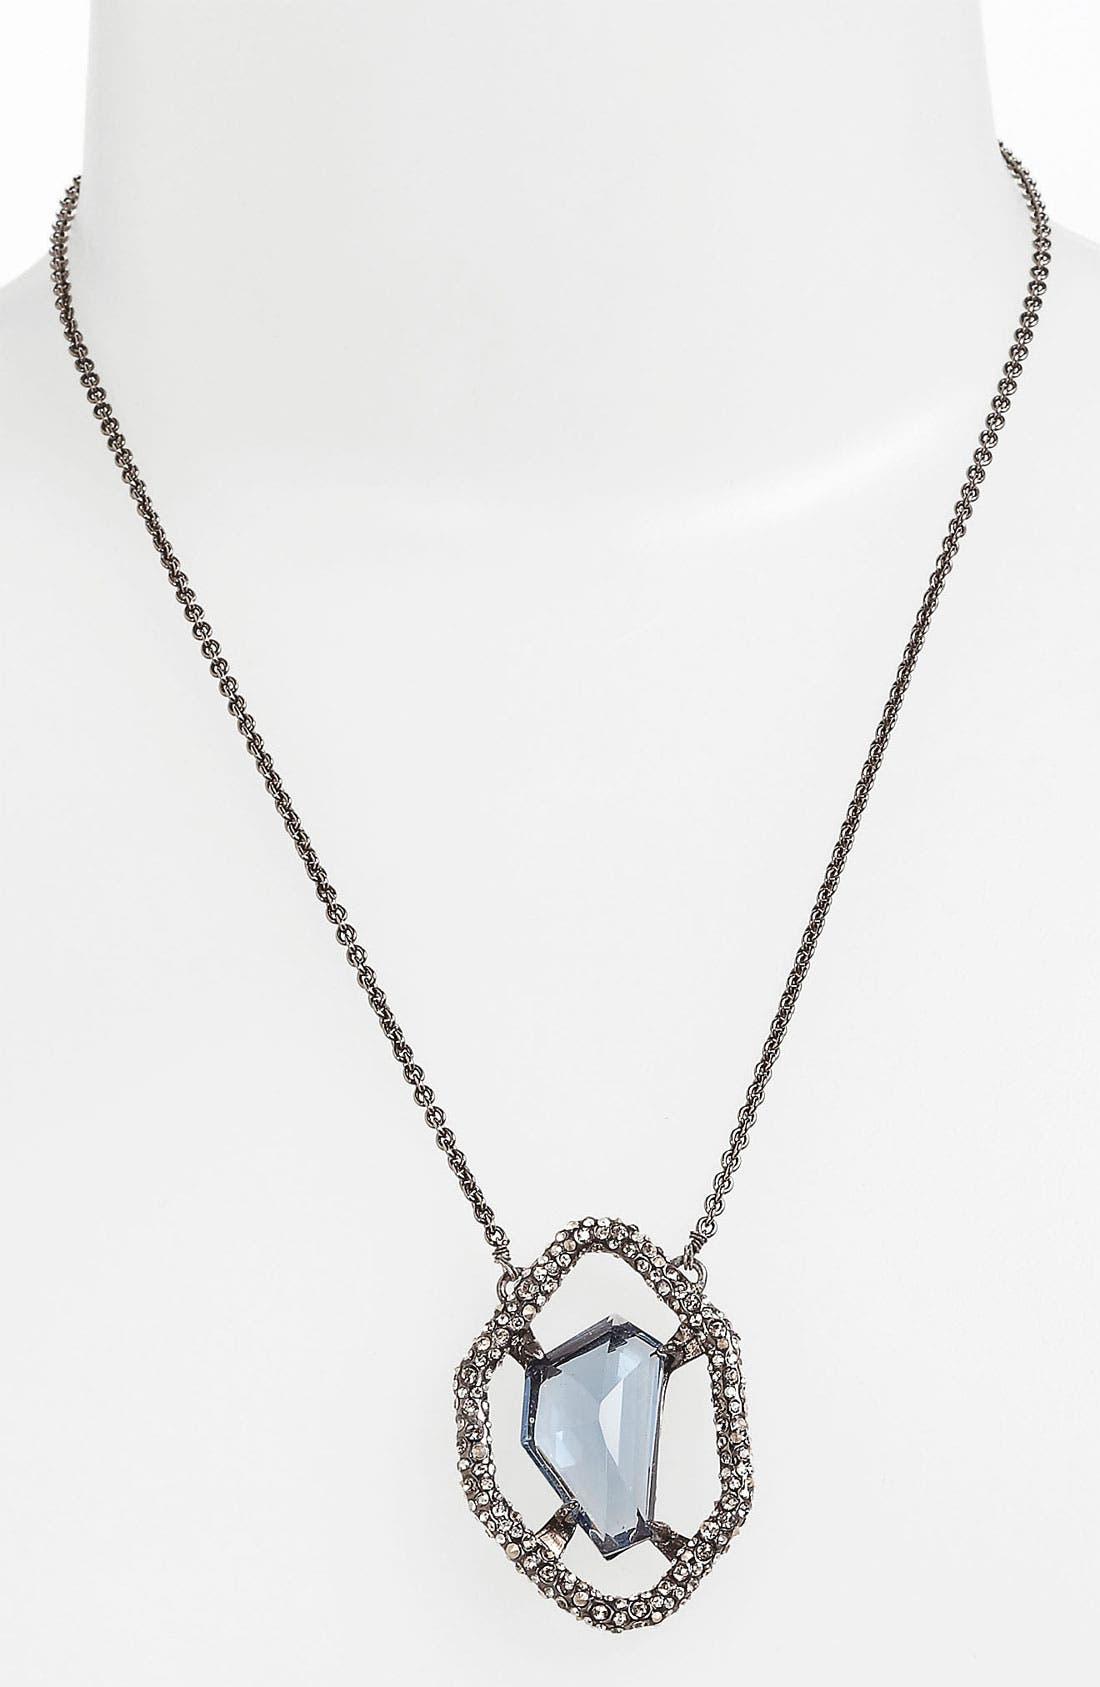 Alternate Image 1 Selected - Alexis Bittar 'Miss Havisham - Delano' Deco Pendant Necklace (Nordstrom Exclusive)